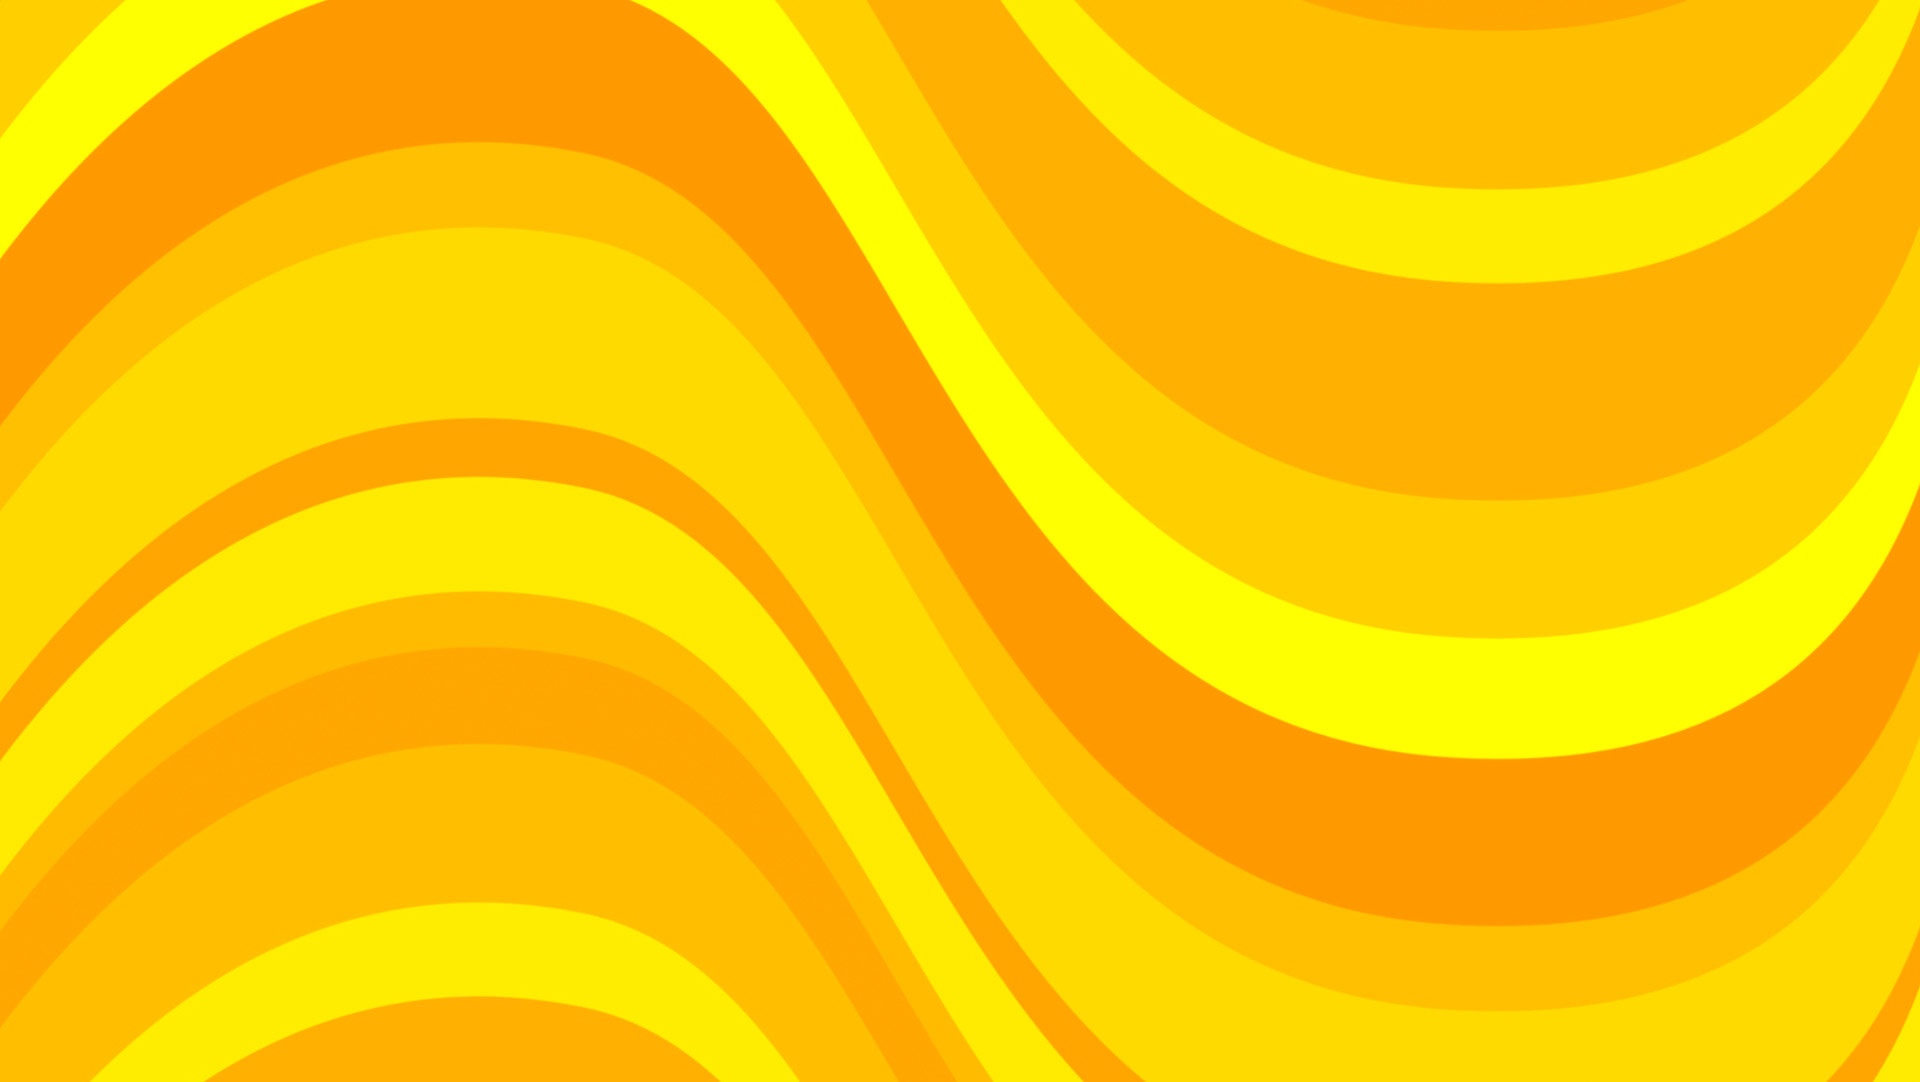 Black And Yellow Abstract Wallpaper 5 Hd Wallpaper